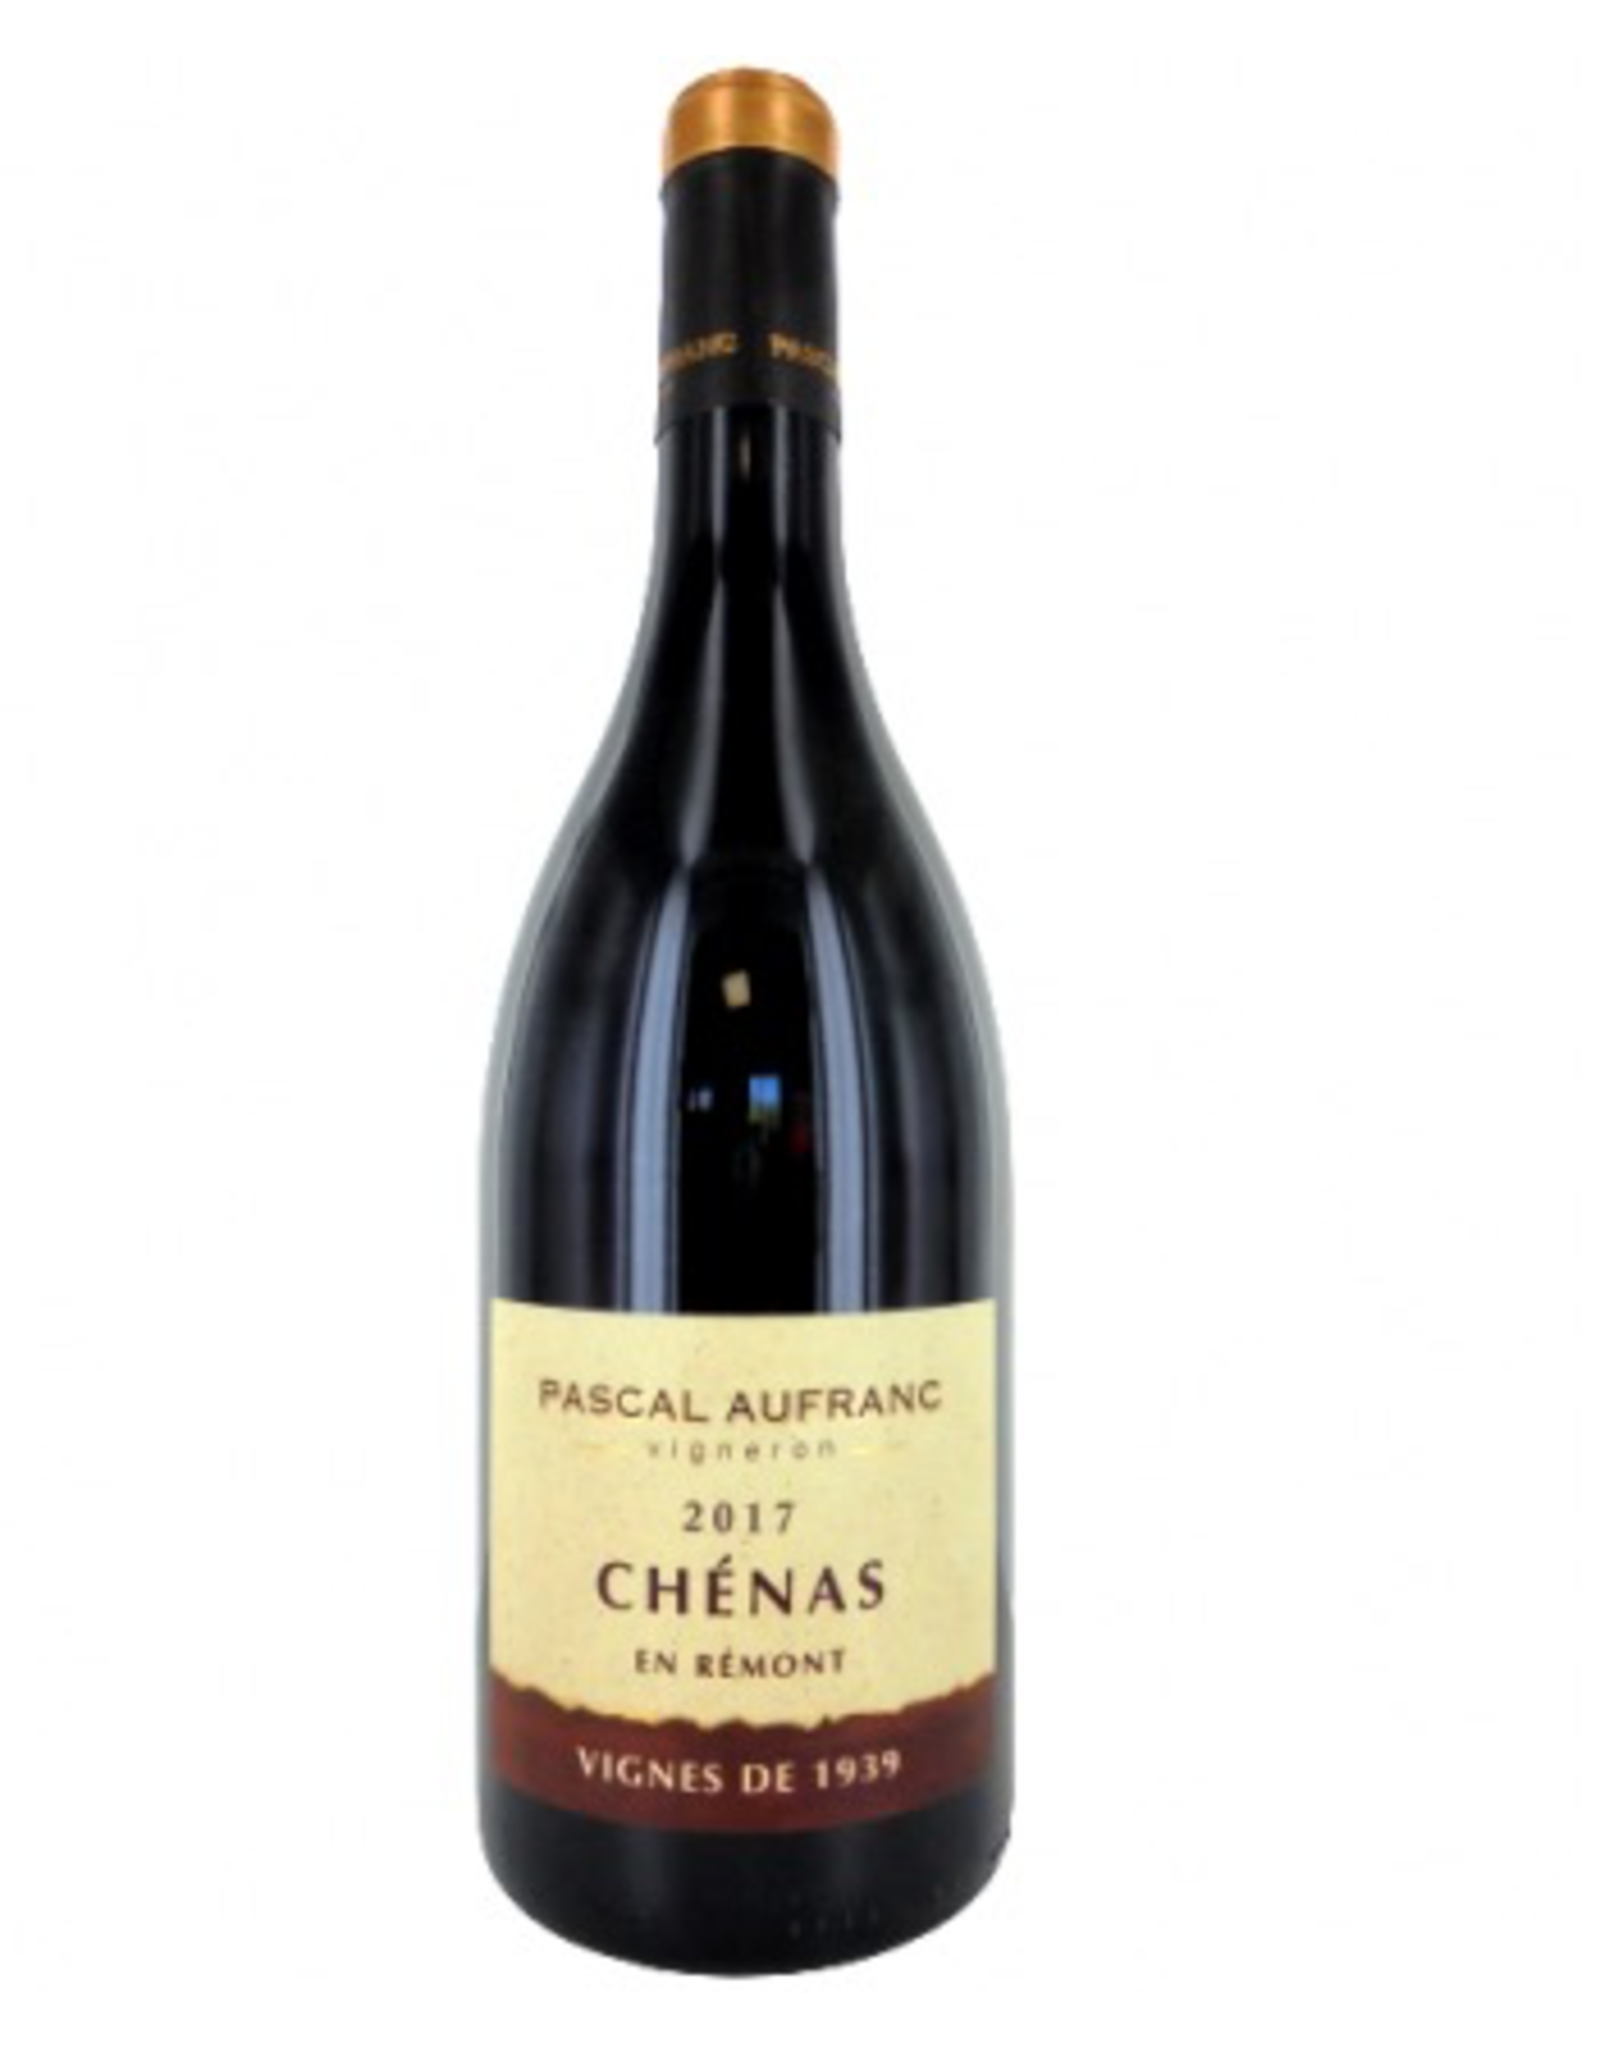 Red Wine 2017, Domaine Pascal Aufranc Chenas, Gamay, Beaujolais, Burgundy, France, 12.5% Alc, CTnr